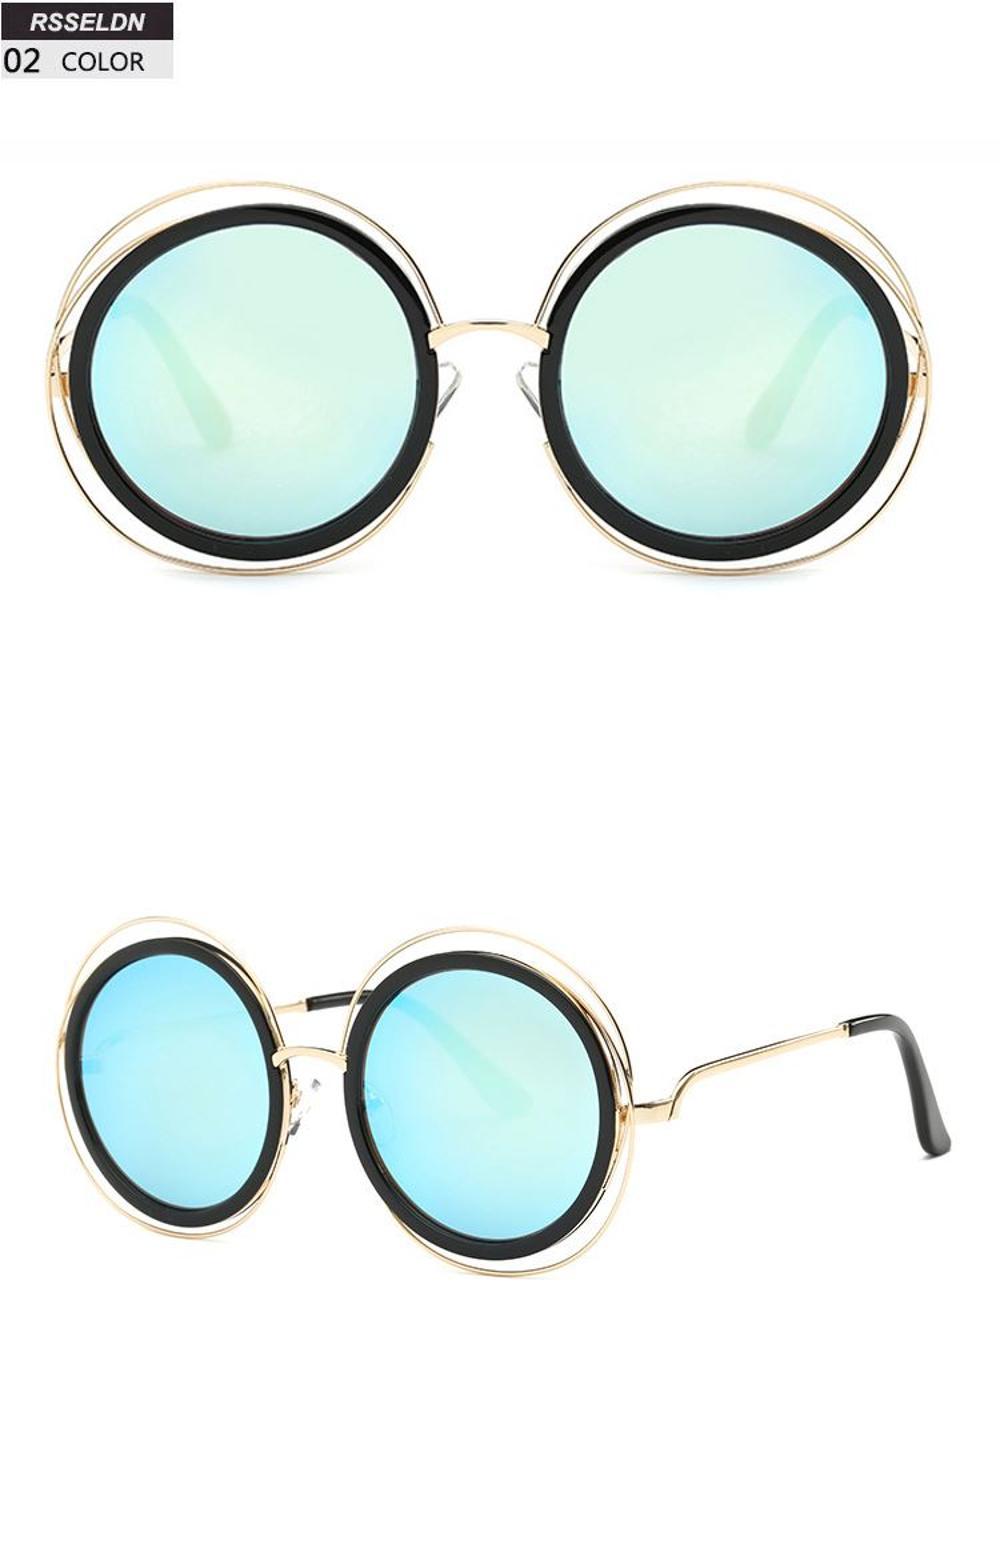 Boyarn Fashion Round Wire Frame Sunglasses Women Brand Retro Mirror ...